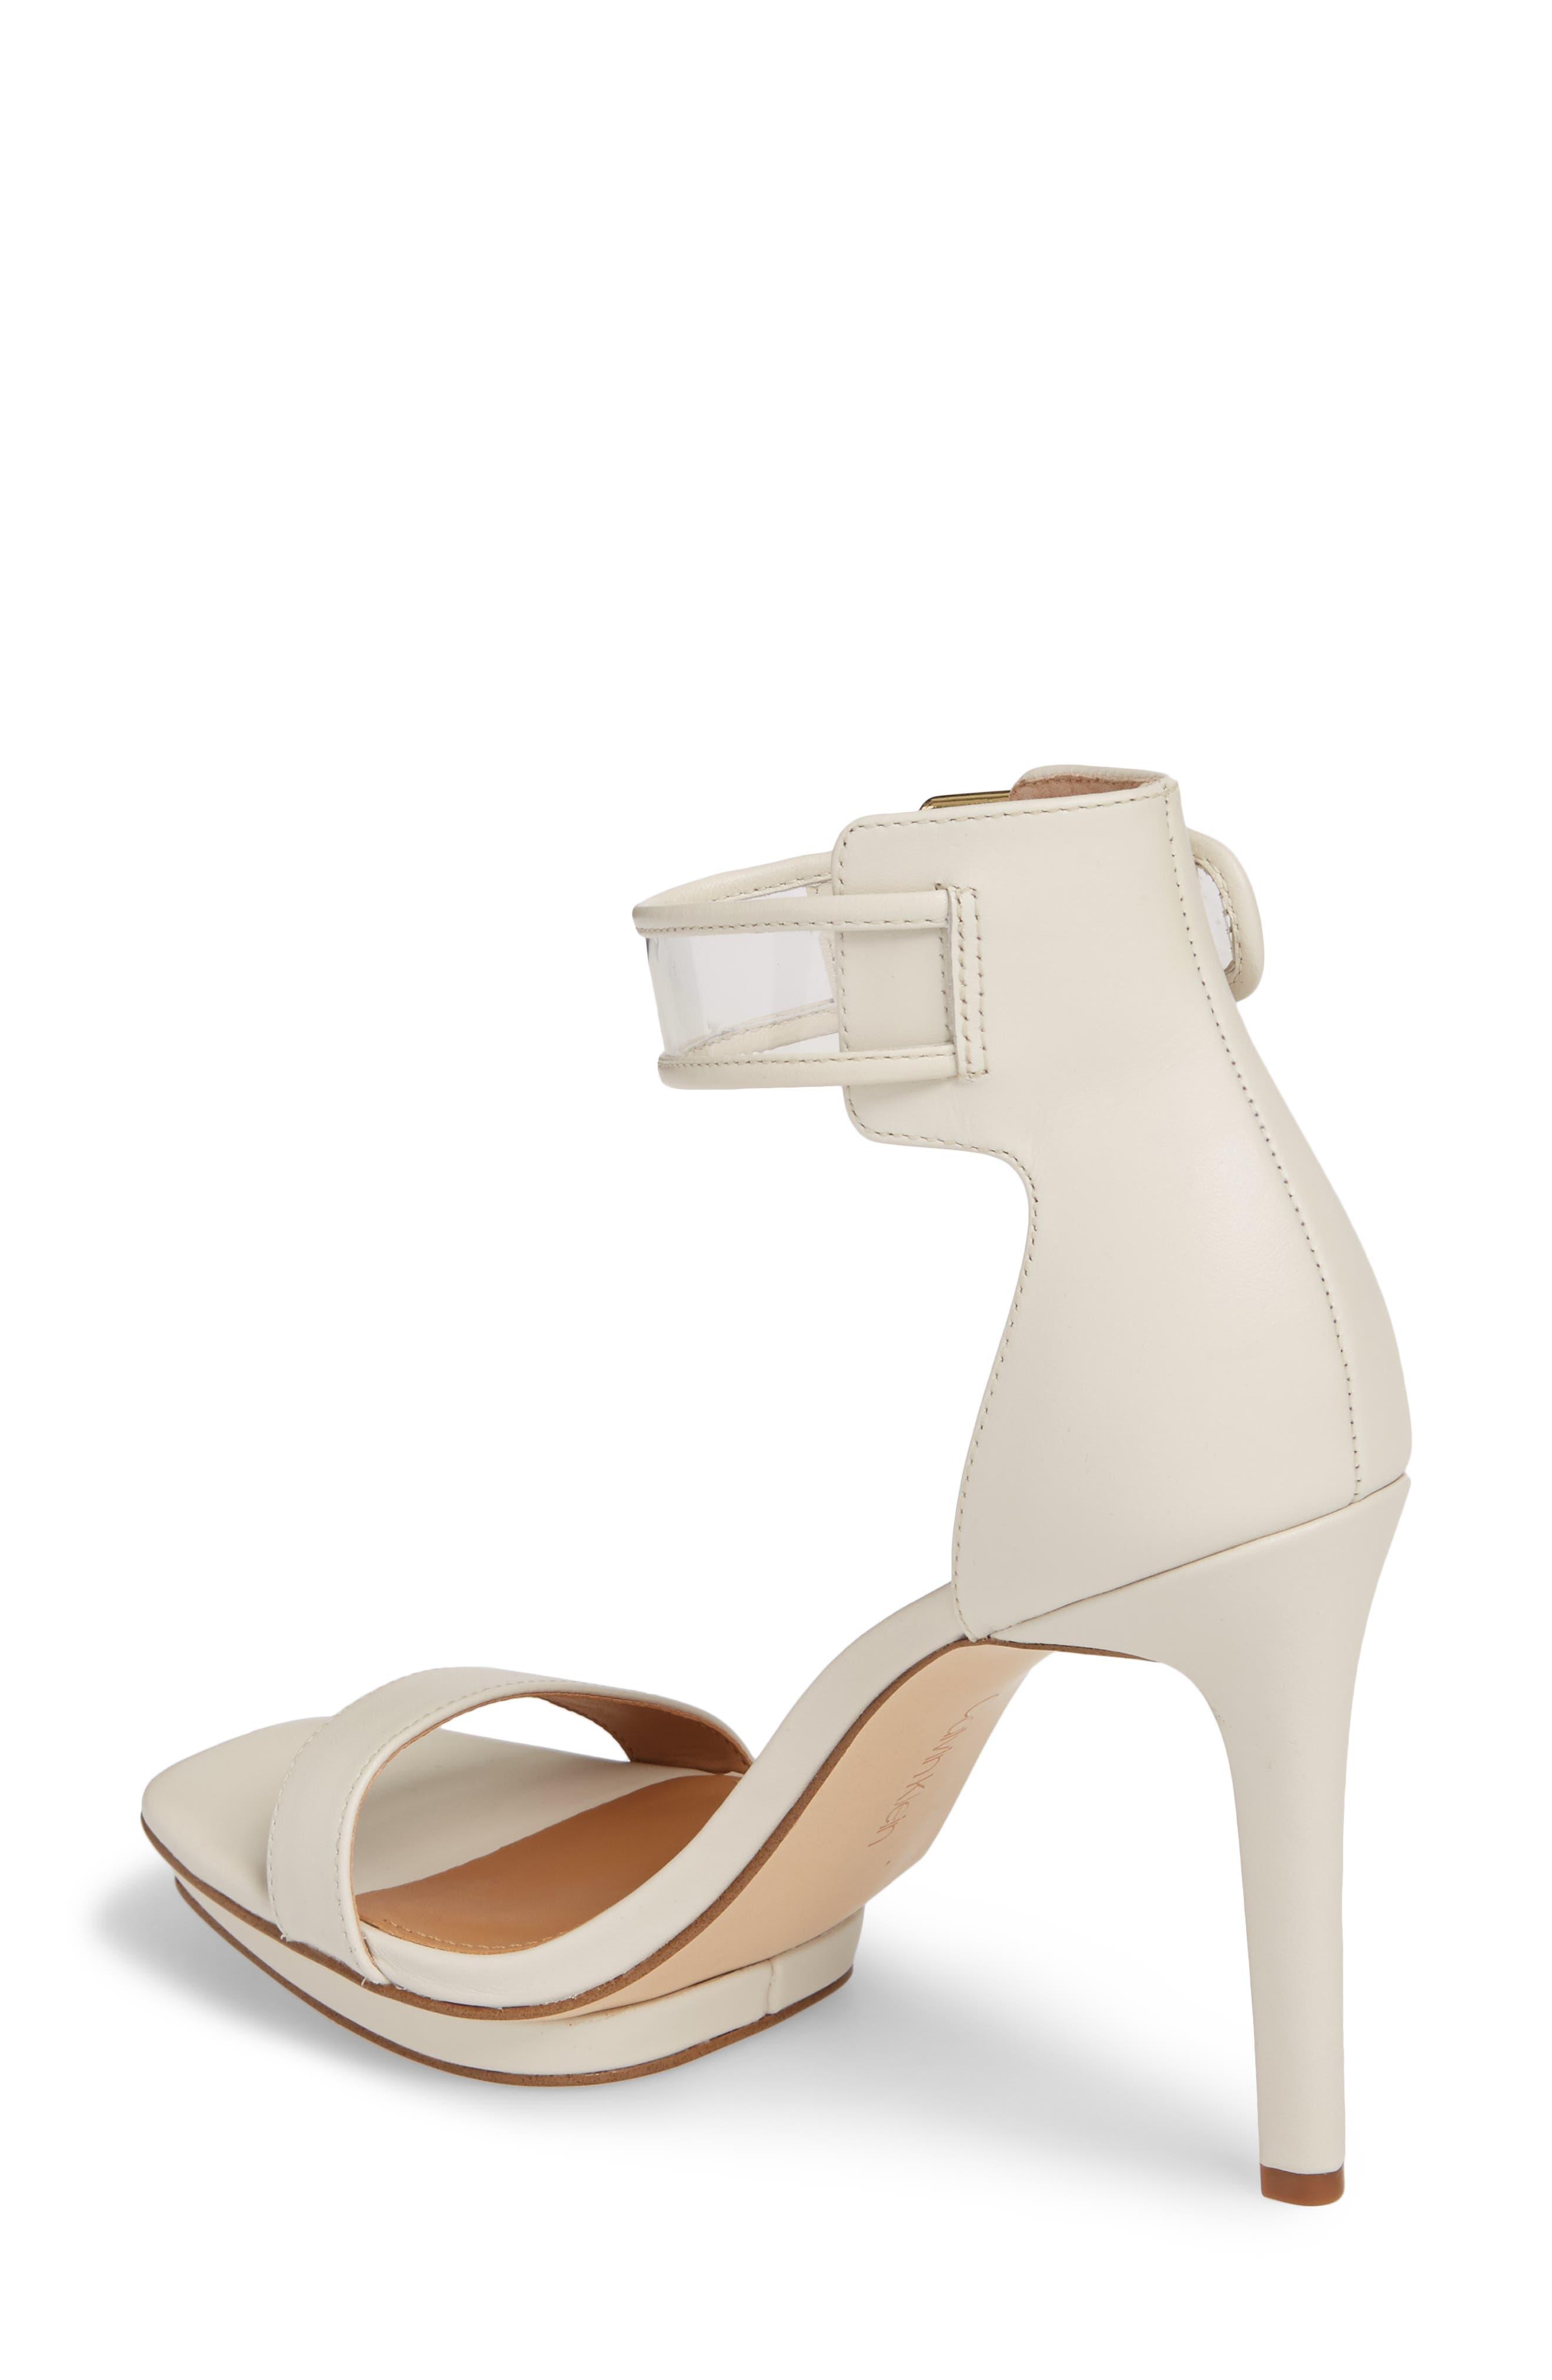 Vable Sandal,                             Alternate thumbnail 2, color,                             Soft White Leather